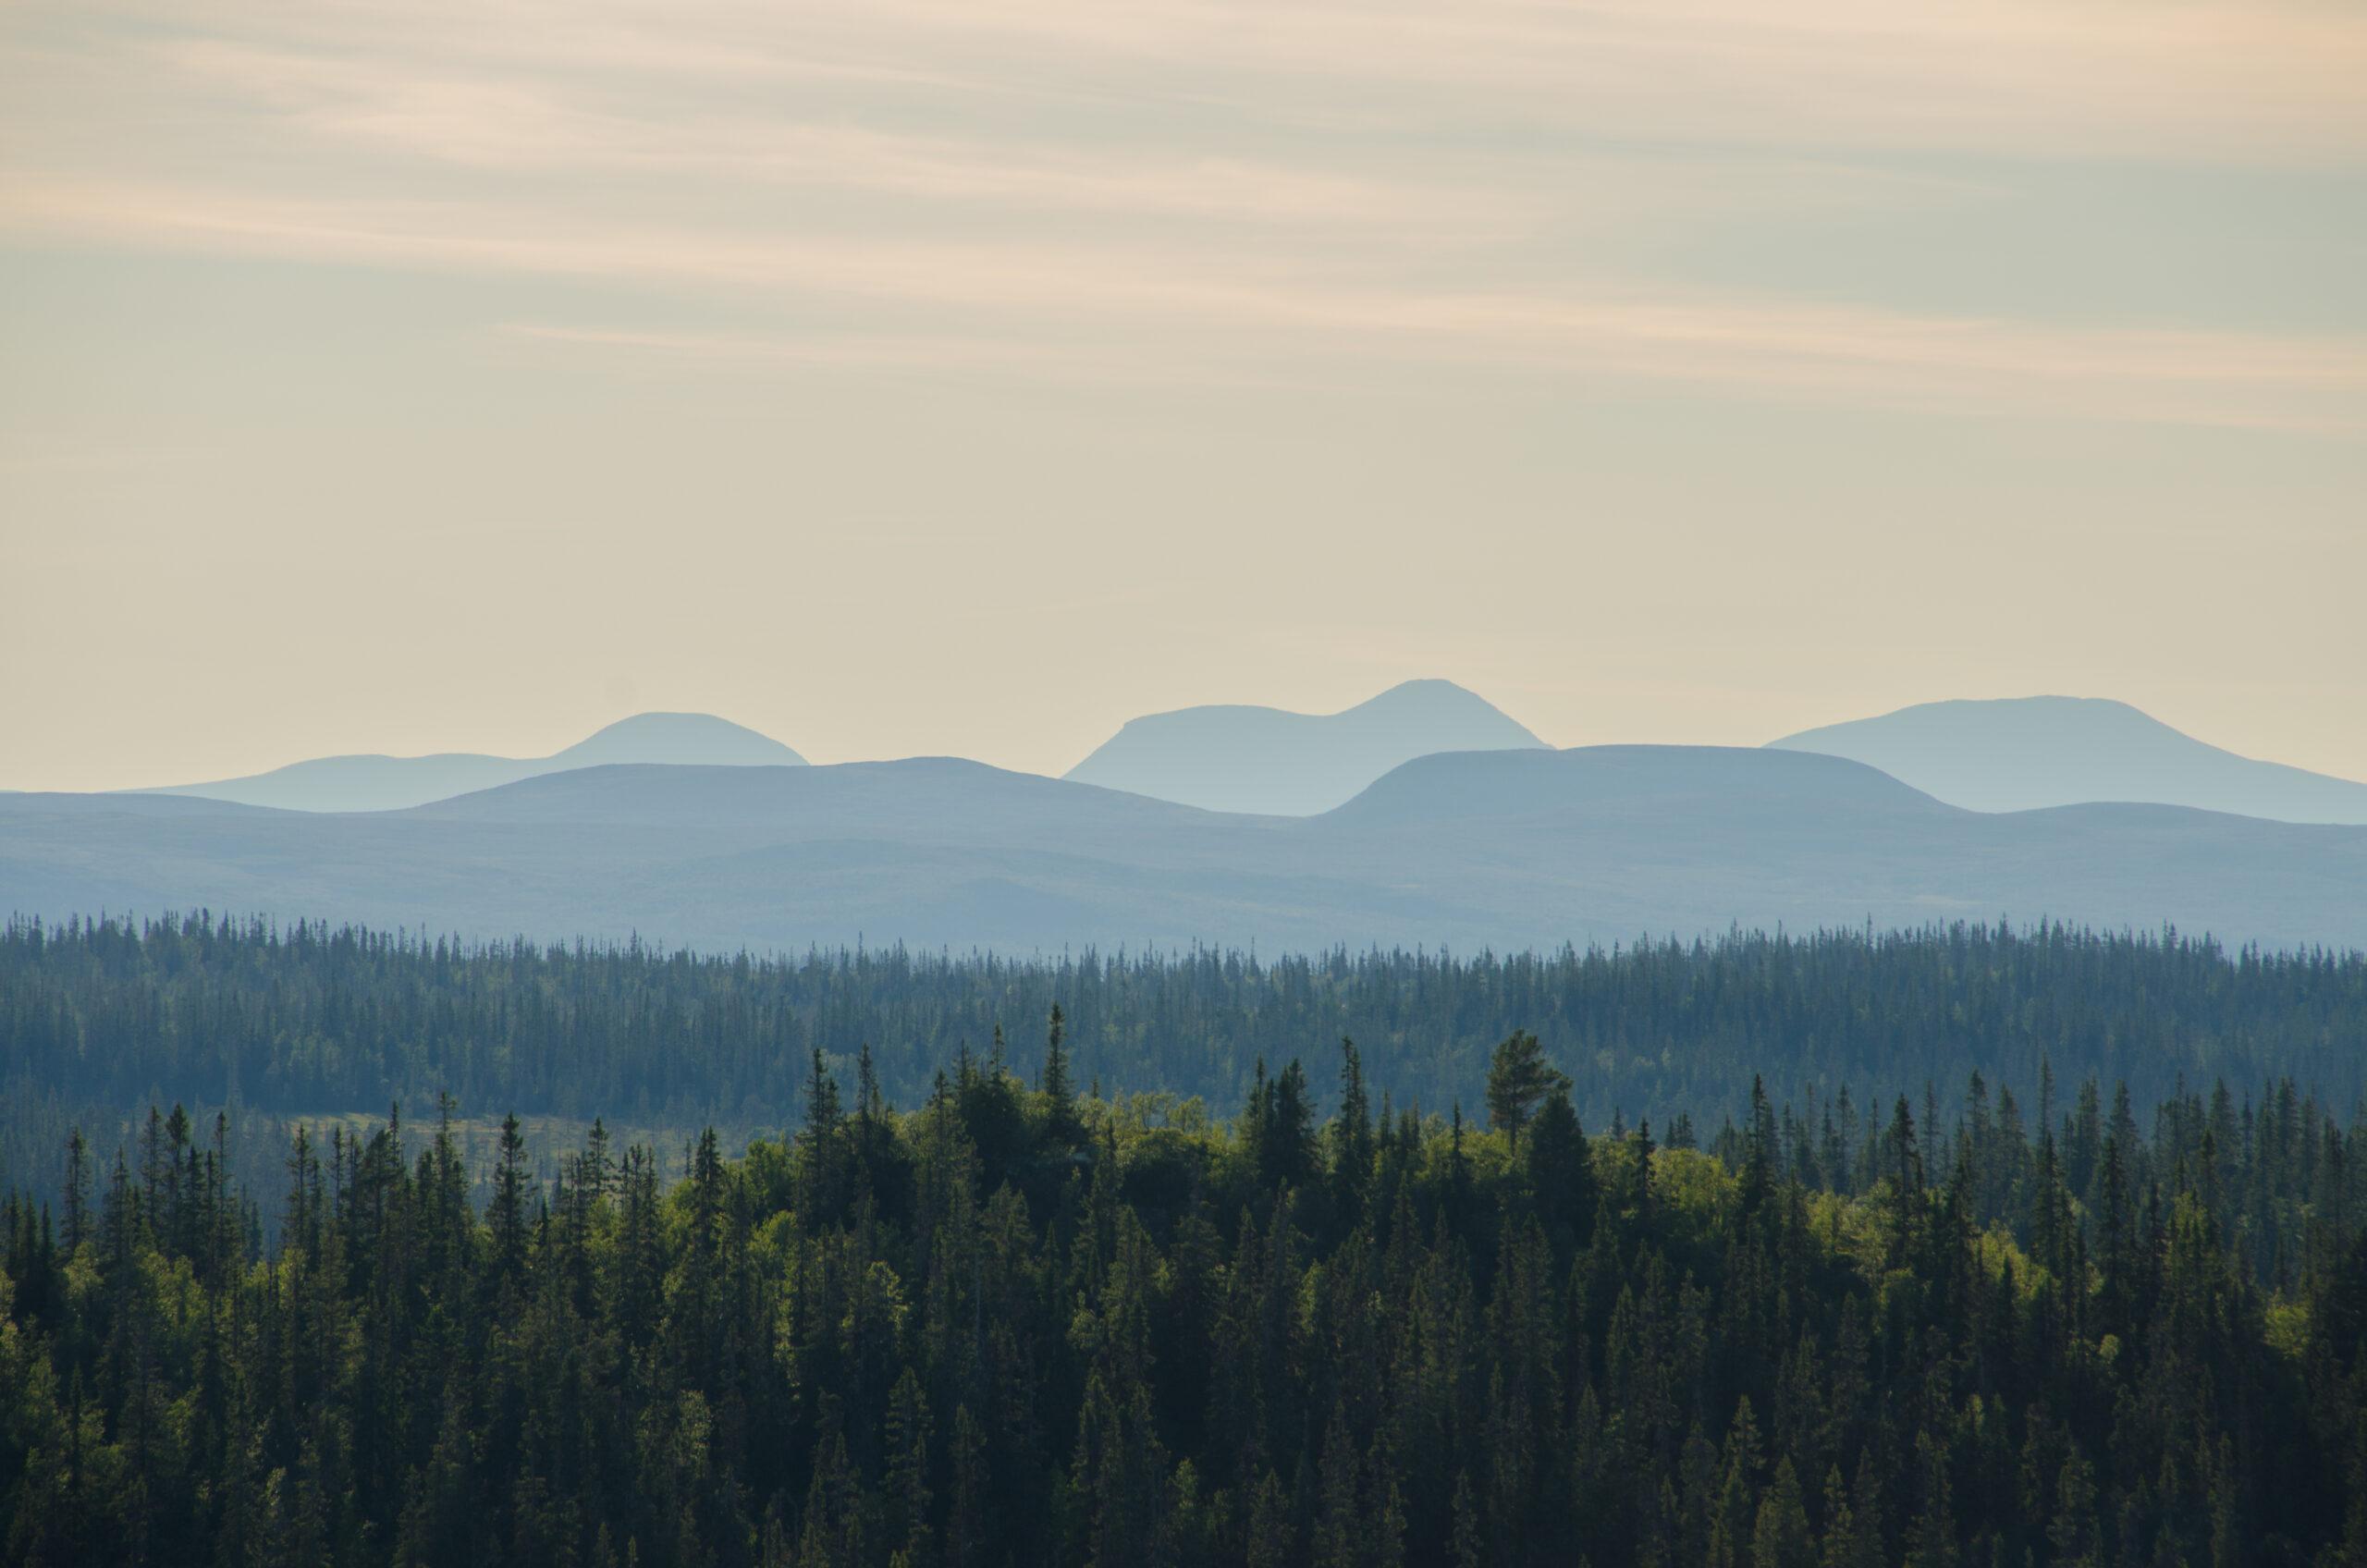 naturskog,urskog,gammelskog,fjällen,naturskyddsfšreningen,landskap,skog